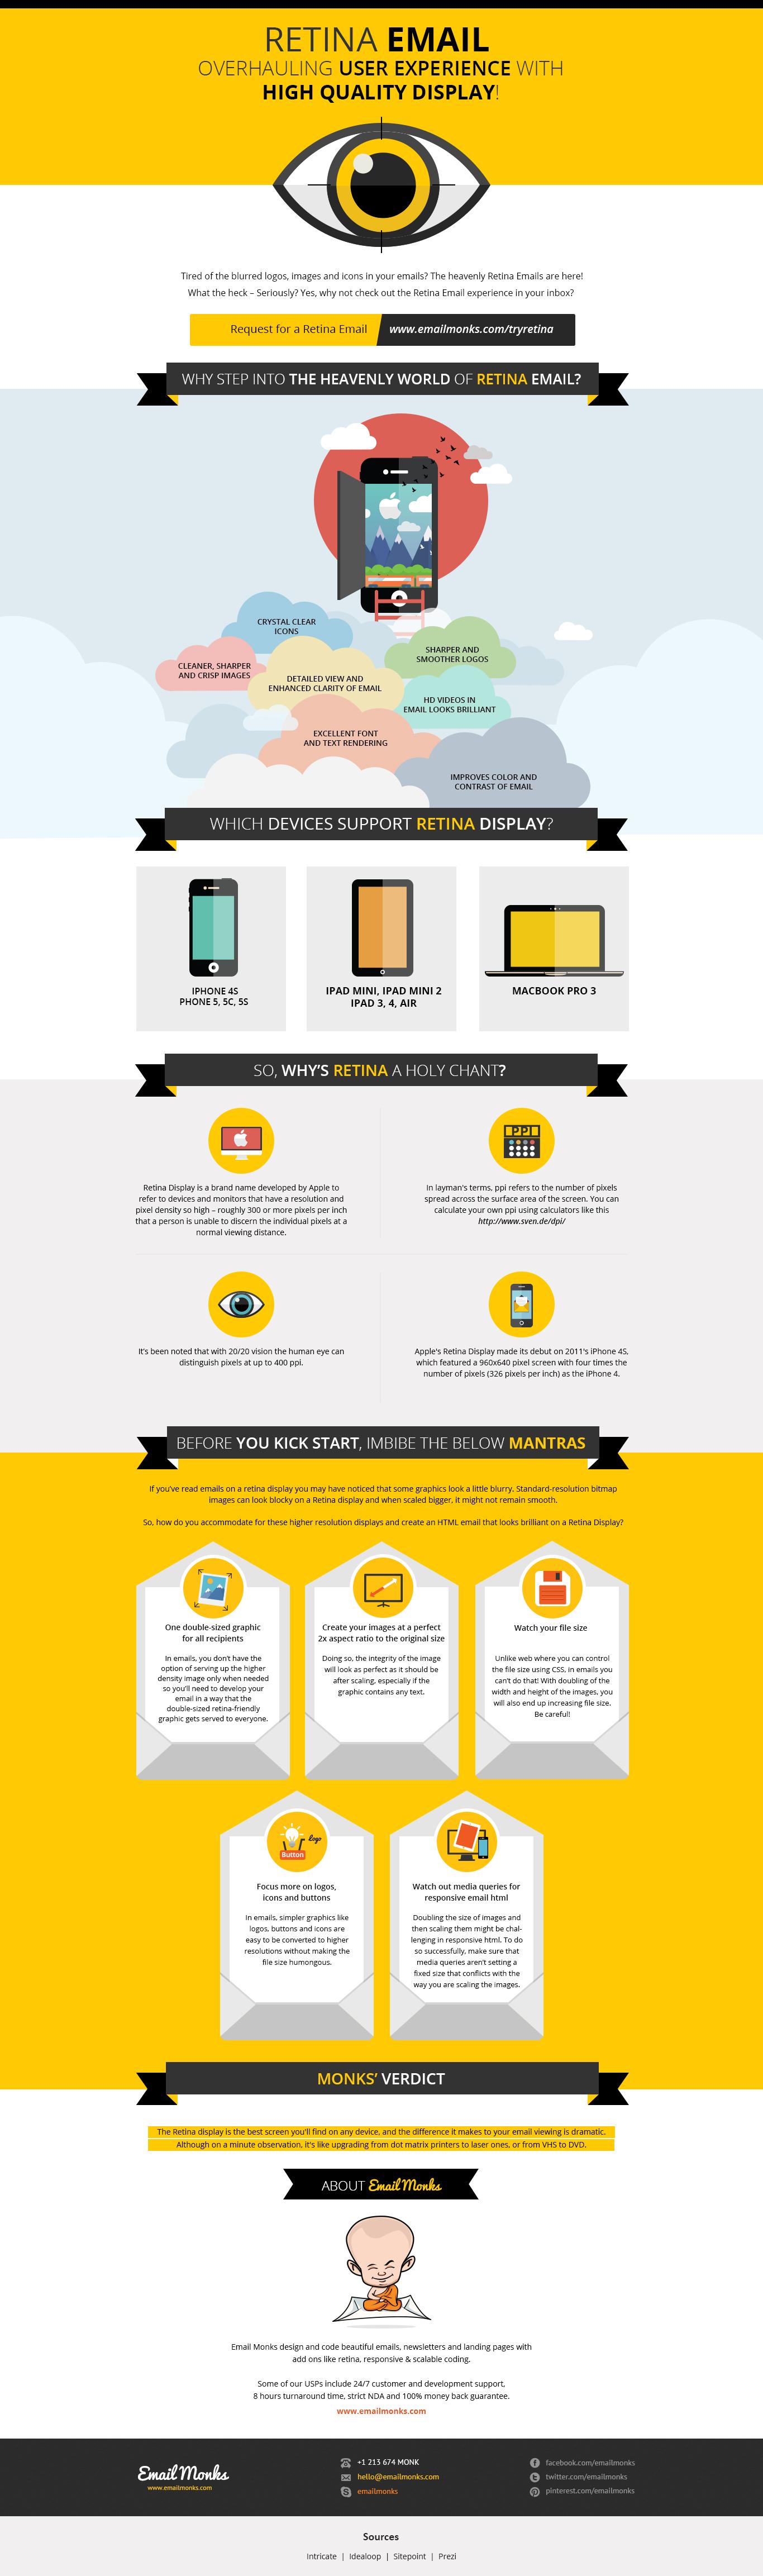 Retina Email Infographic